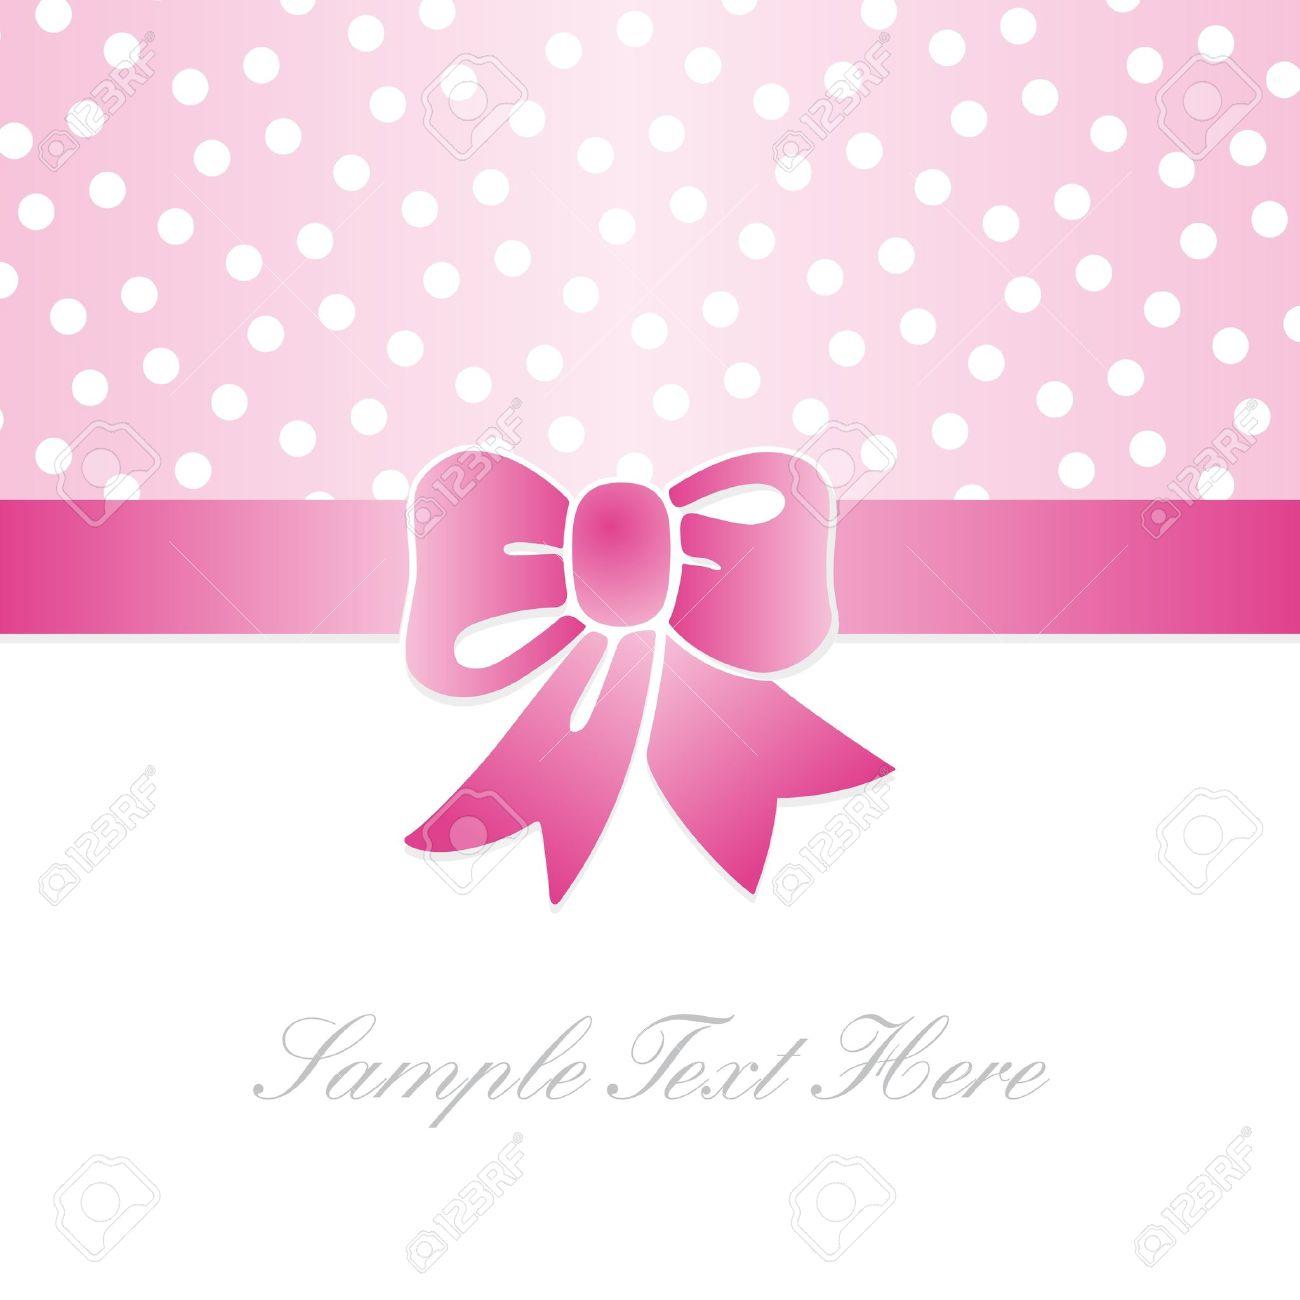 gift card with pink polka dots royalty free cliparts vectors and